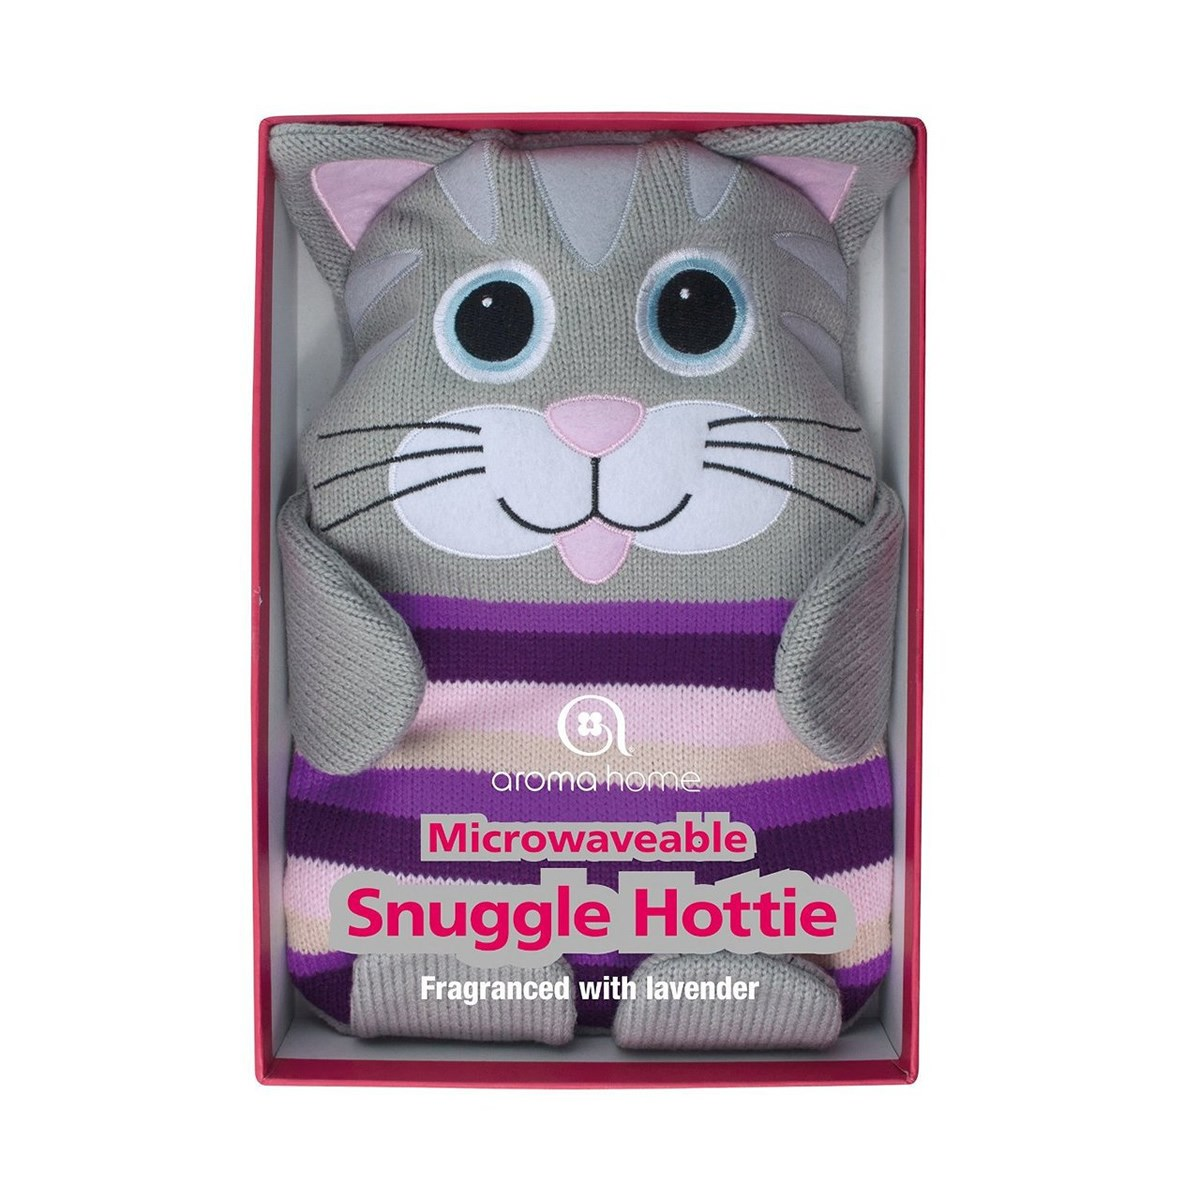 Aroma Home Microwaveable Snuggle Hottie - Cat